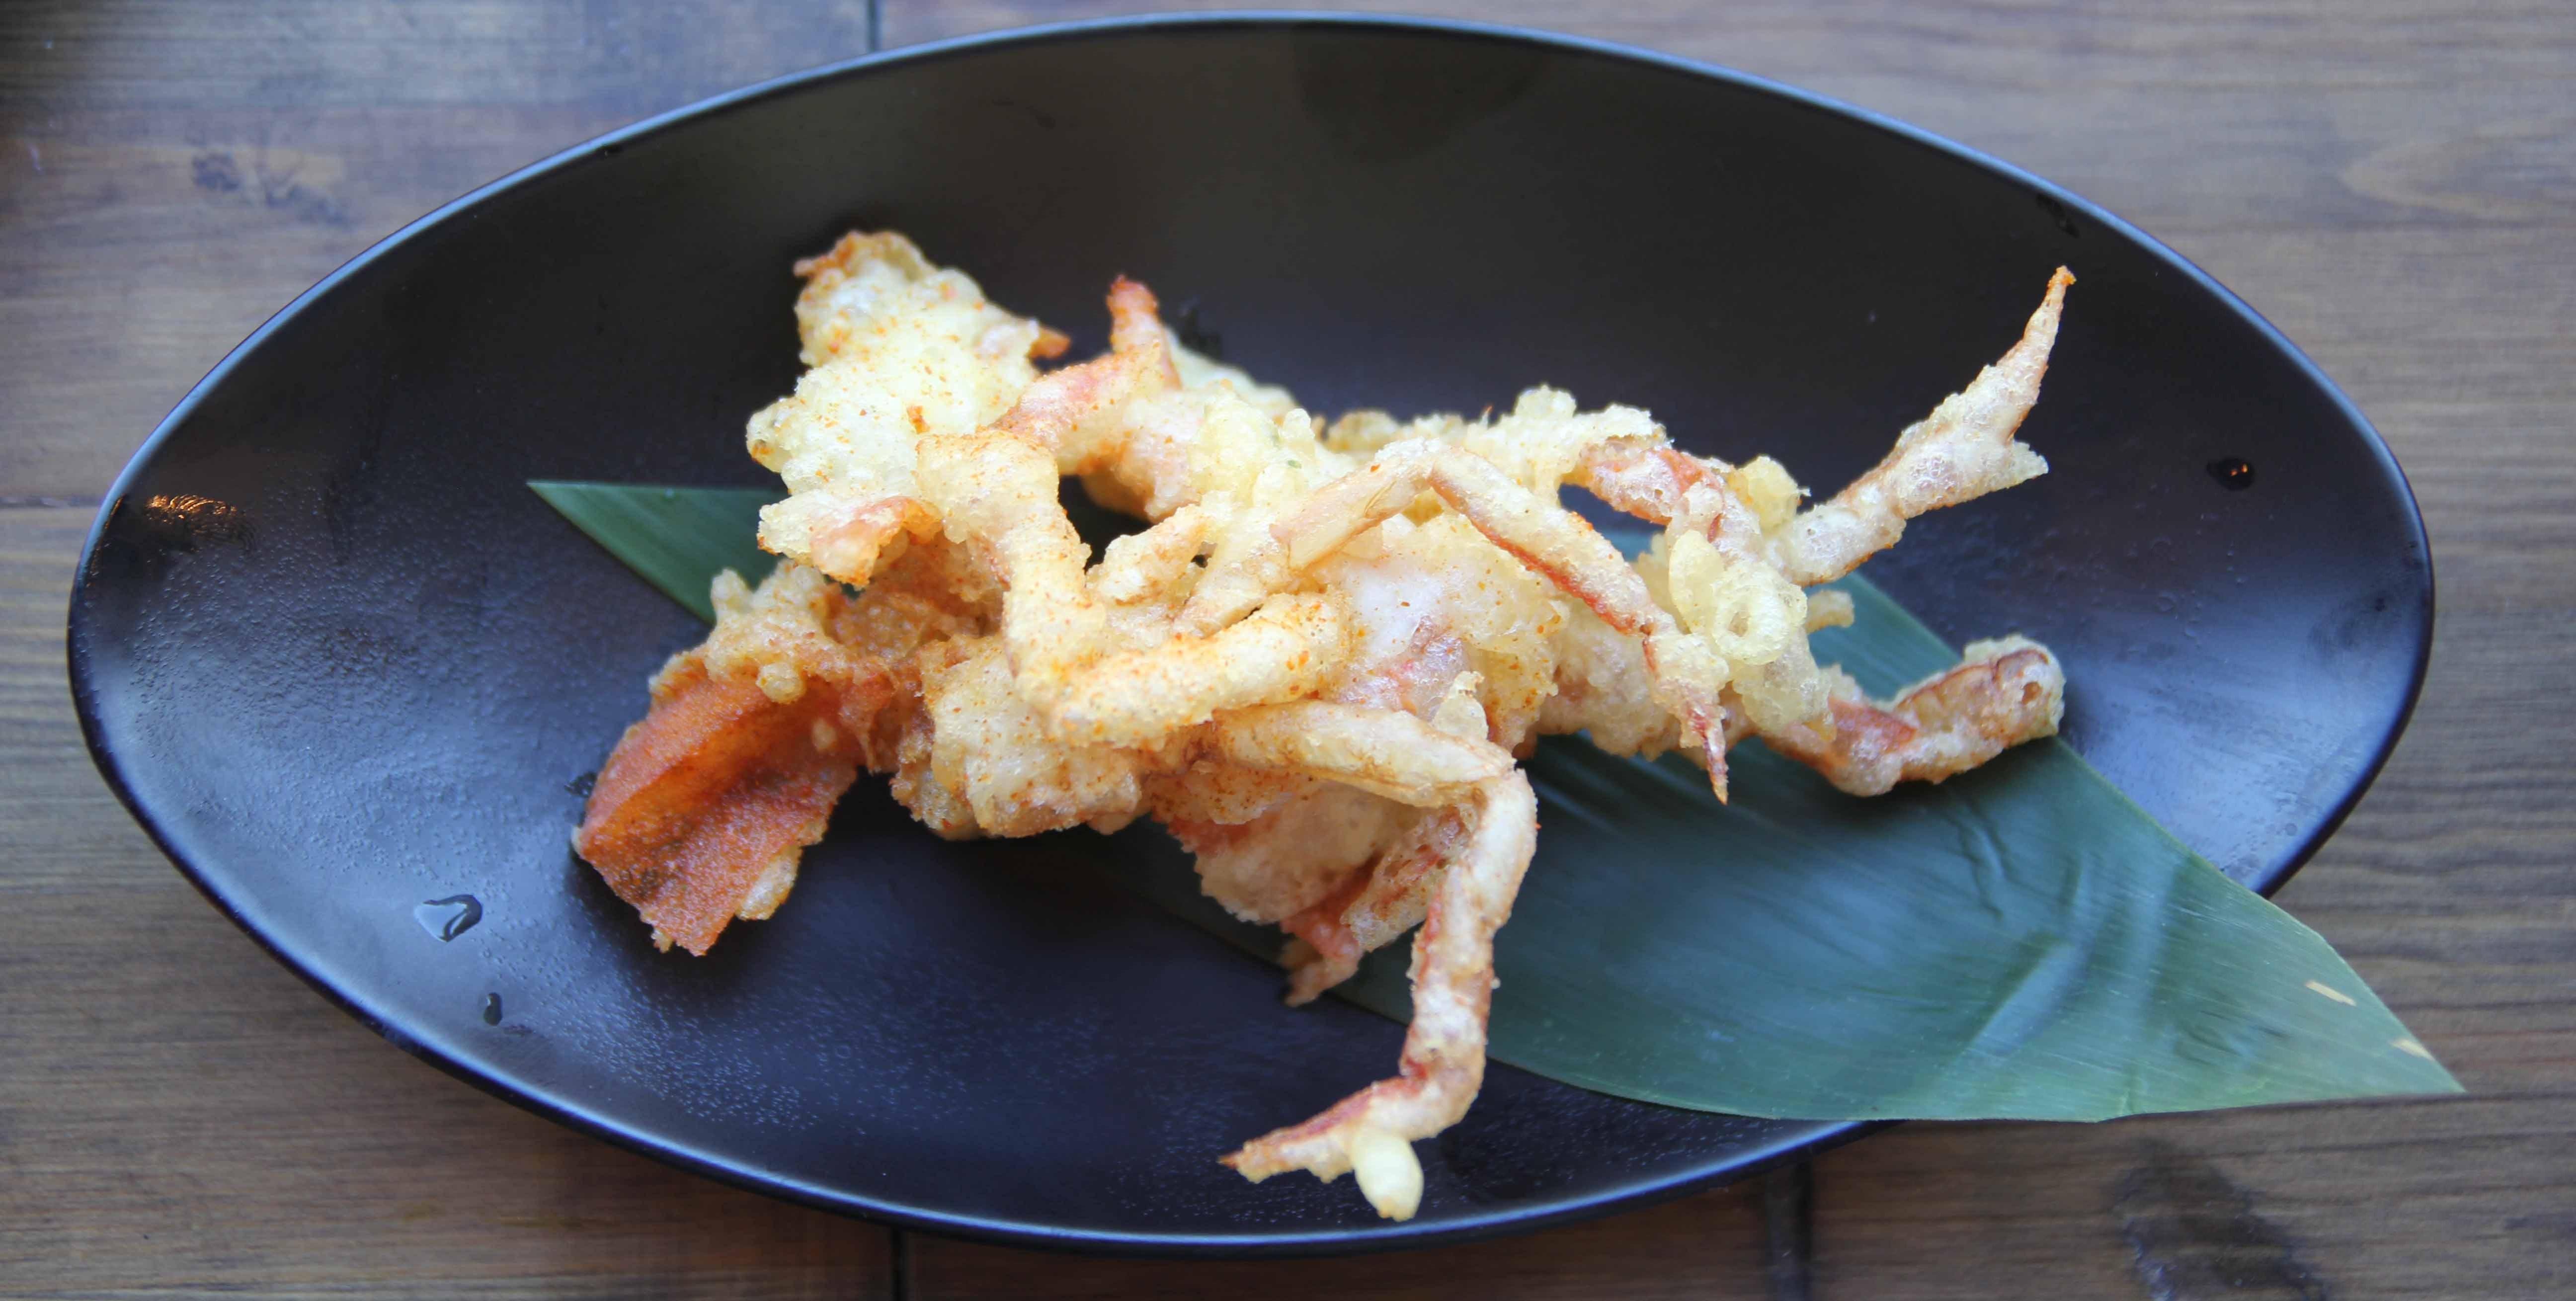 Soft-shell crab tempura